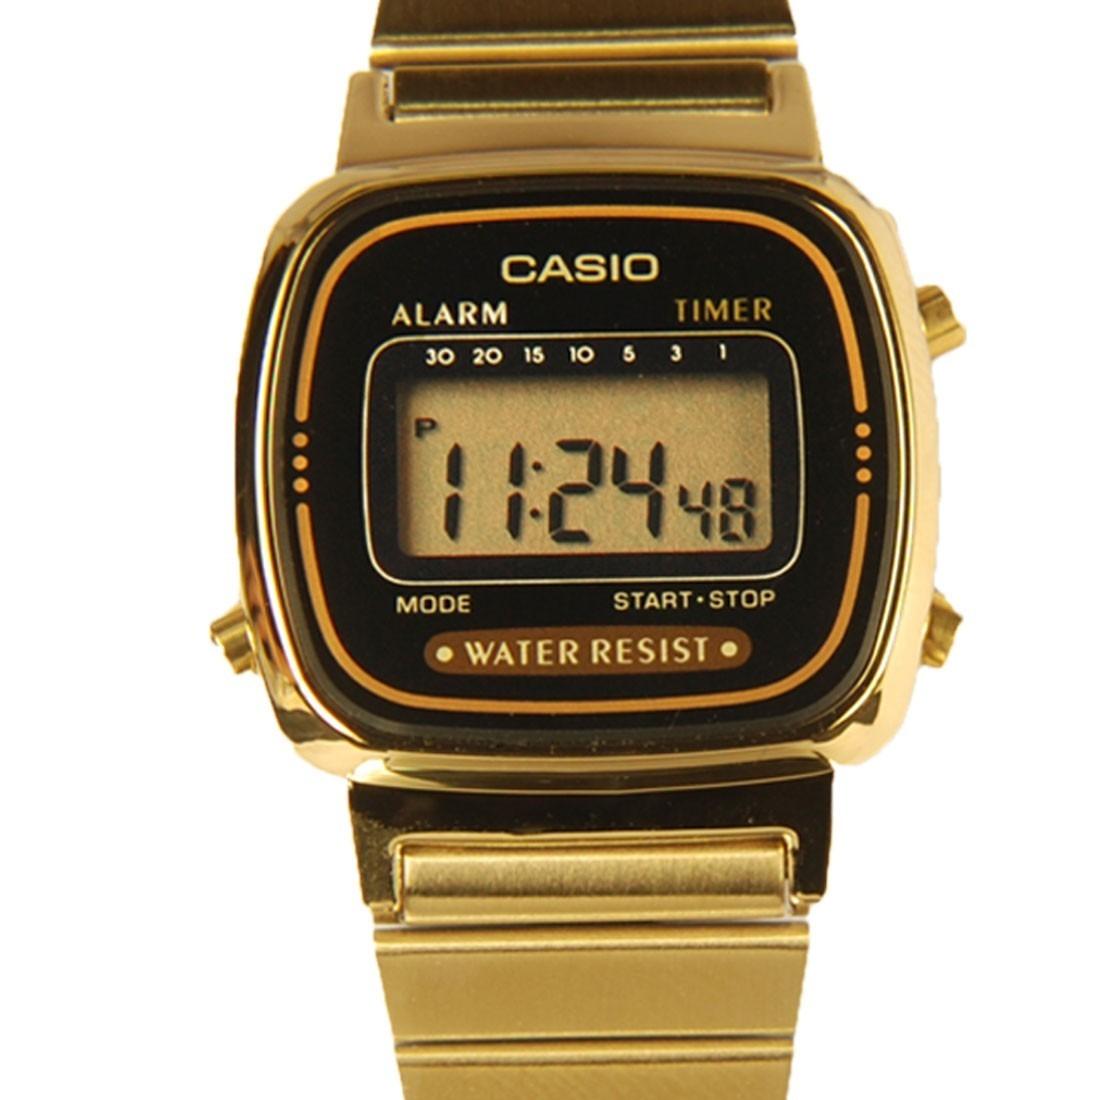 0b1d728caee Relogio Casio La-670wga-1 9 Fem Retrô Vintage Dourado Alarm - R  169 ...